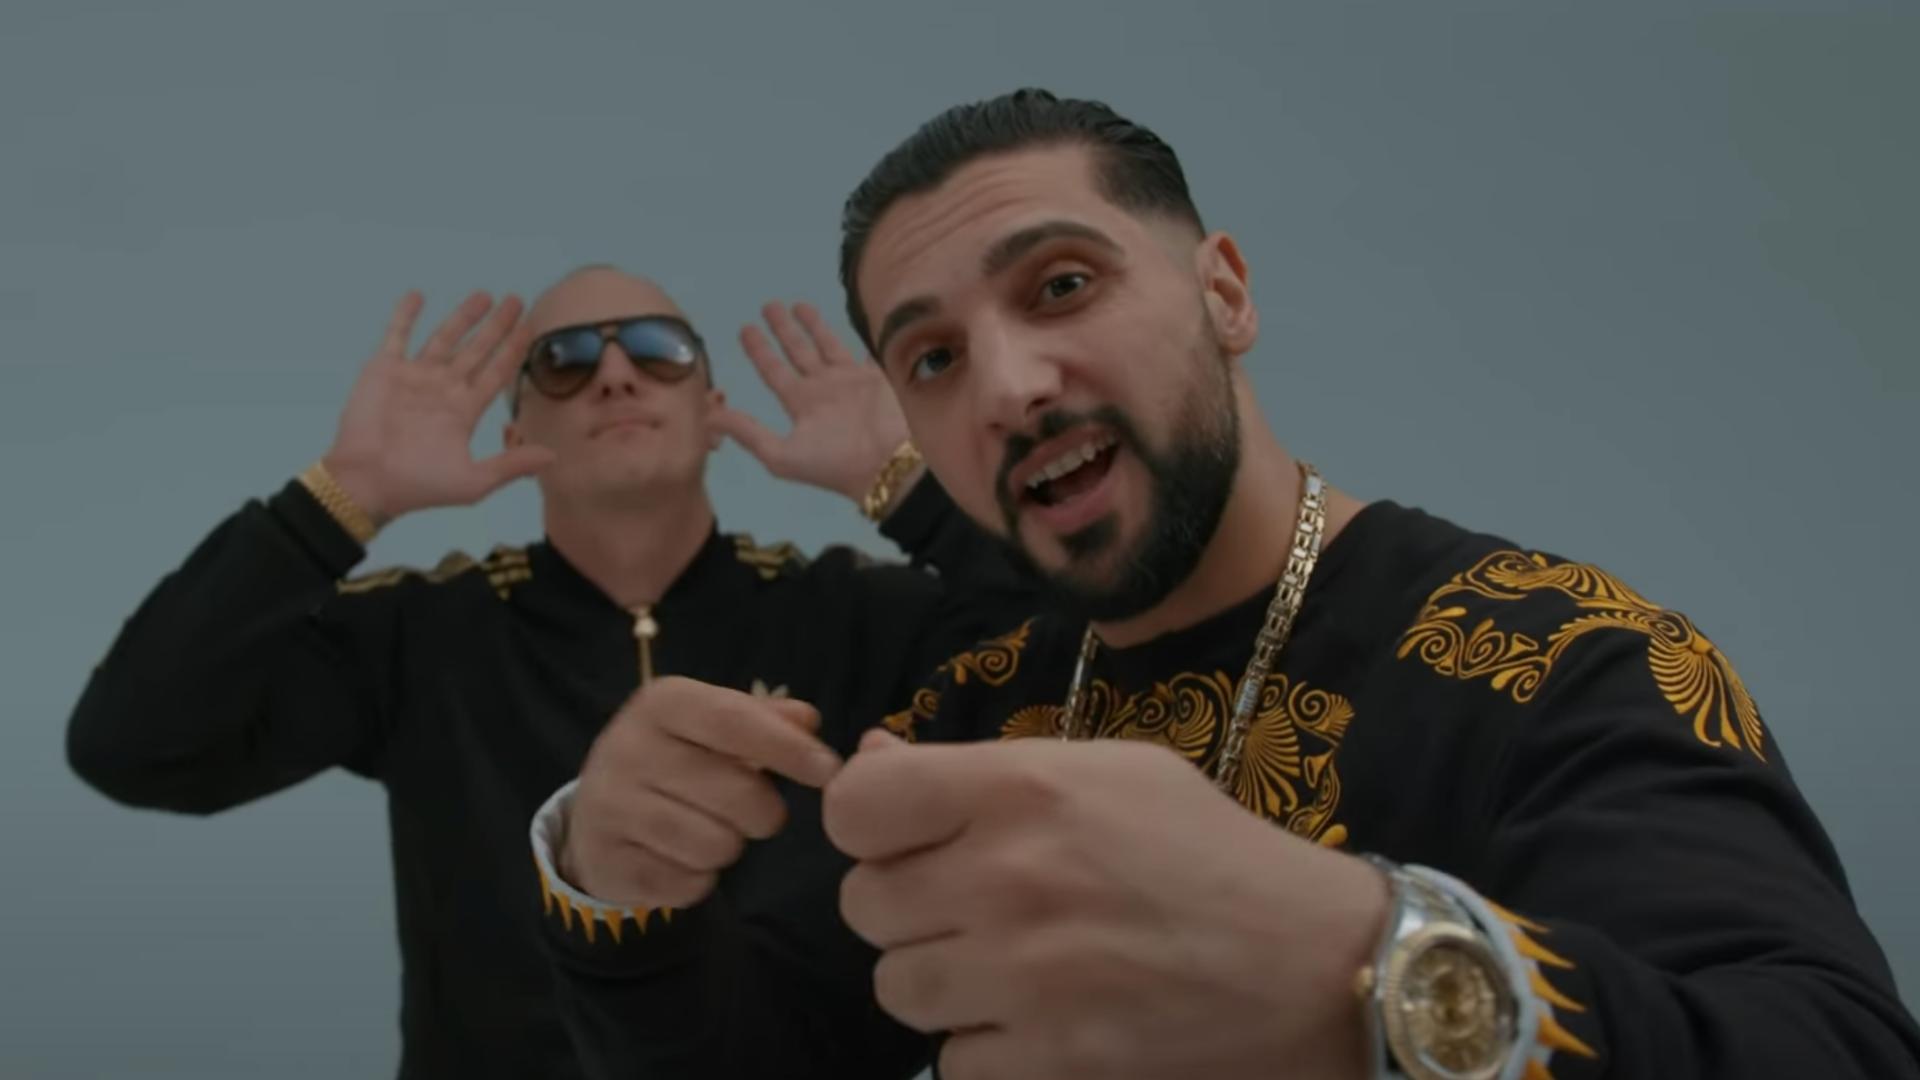 AJÉ feat. Olexesh - Euro | 16BARS